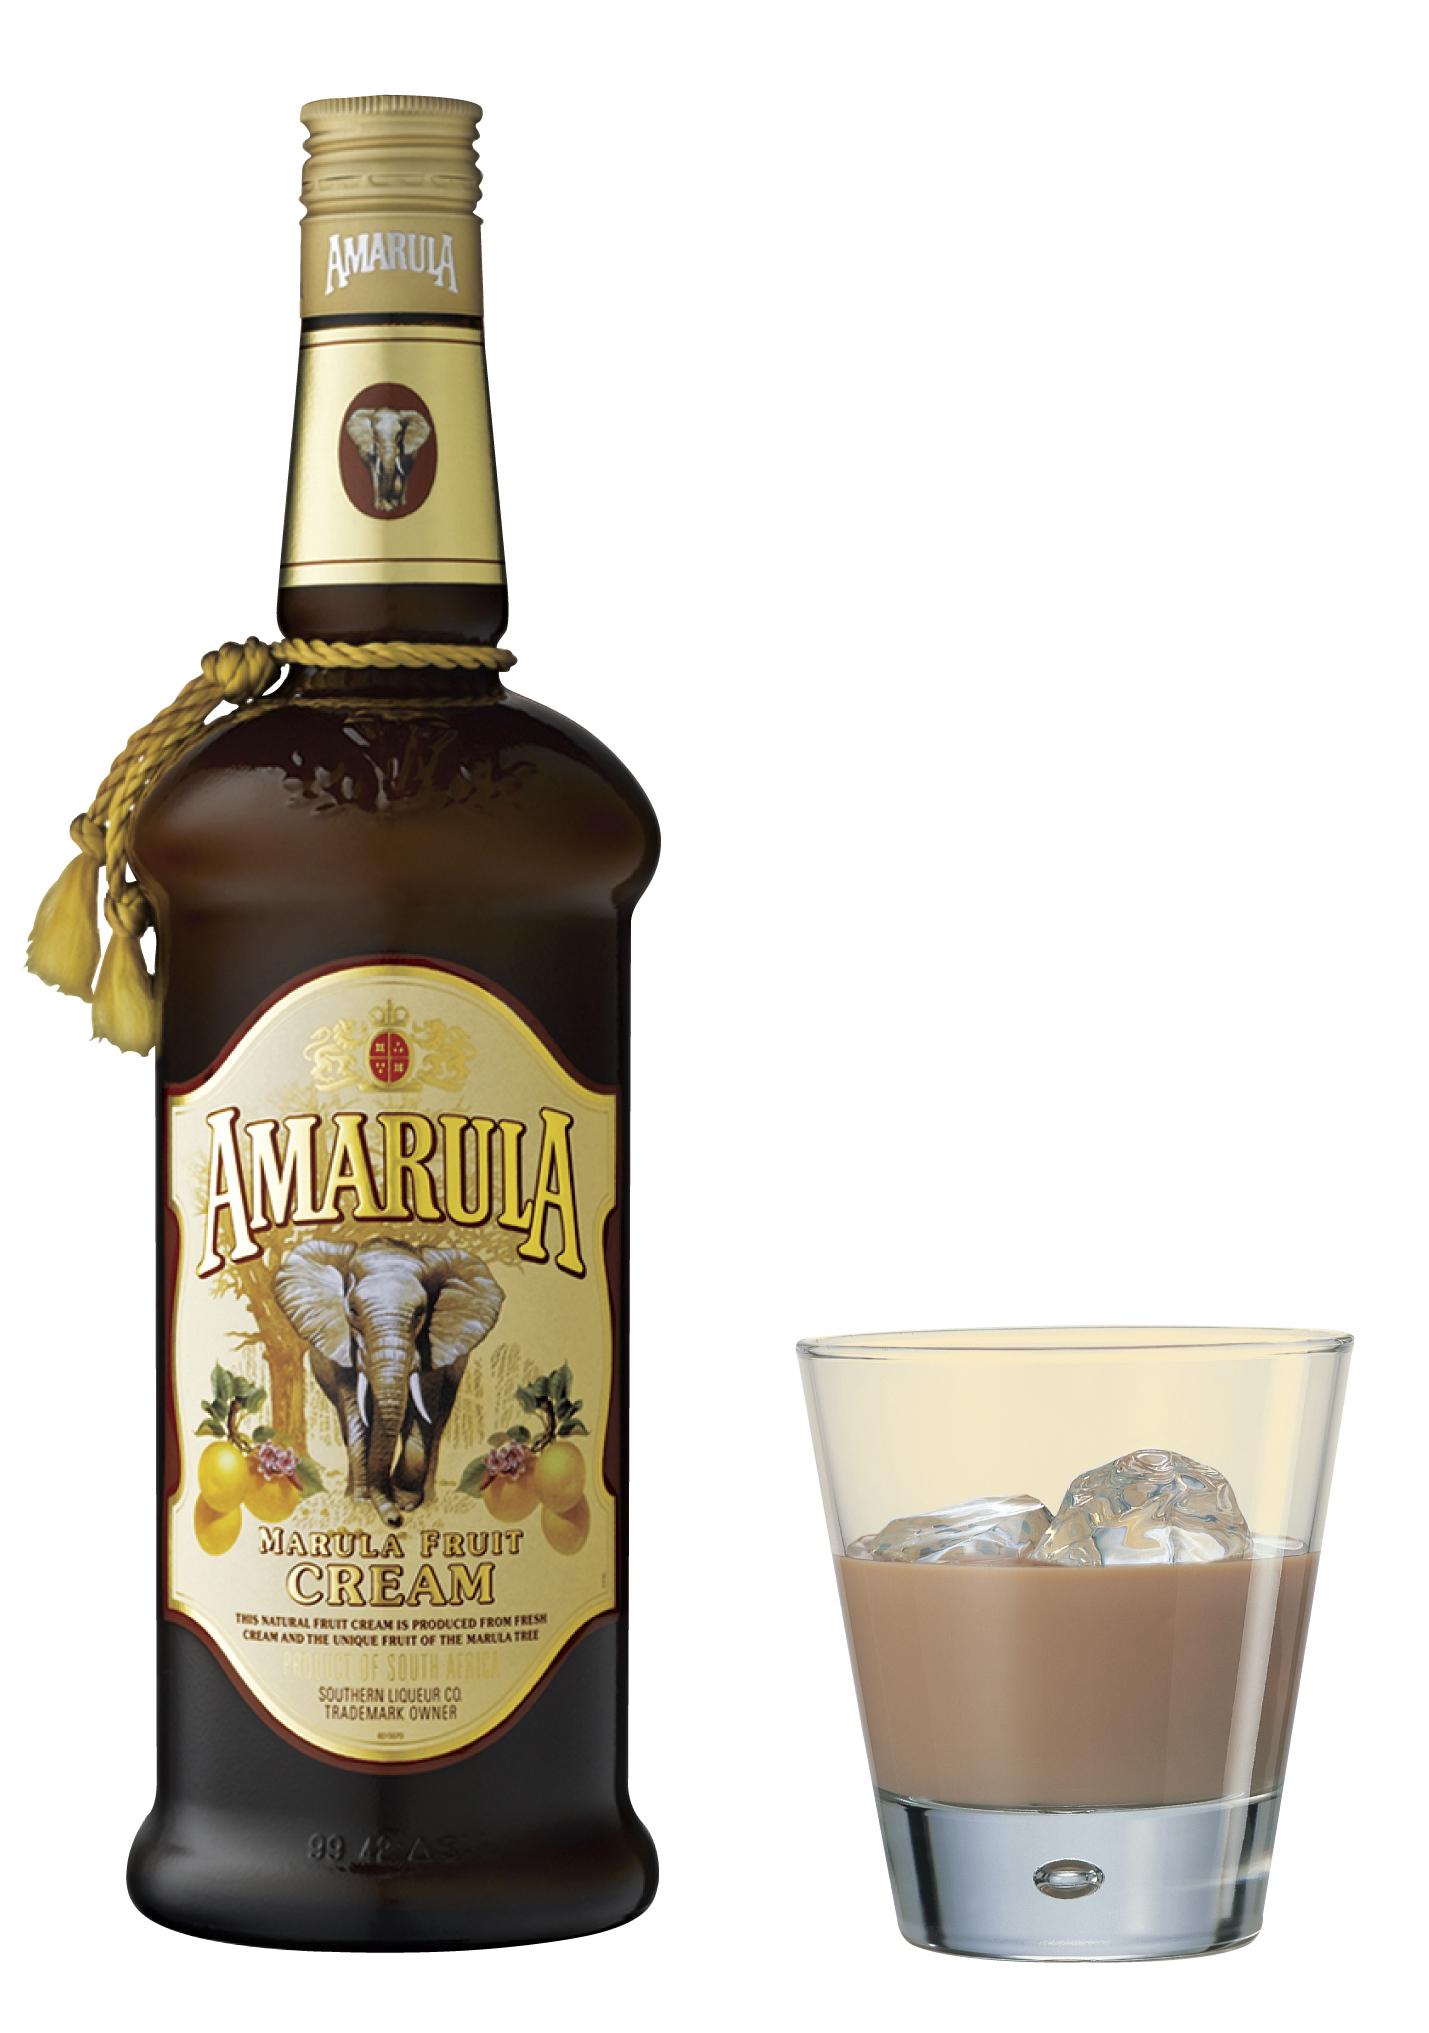 MatDrikke Amarula 0711 - Flaske og glass